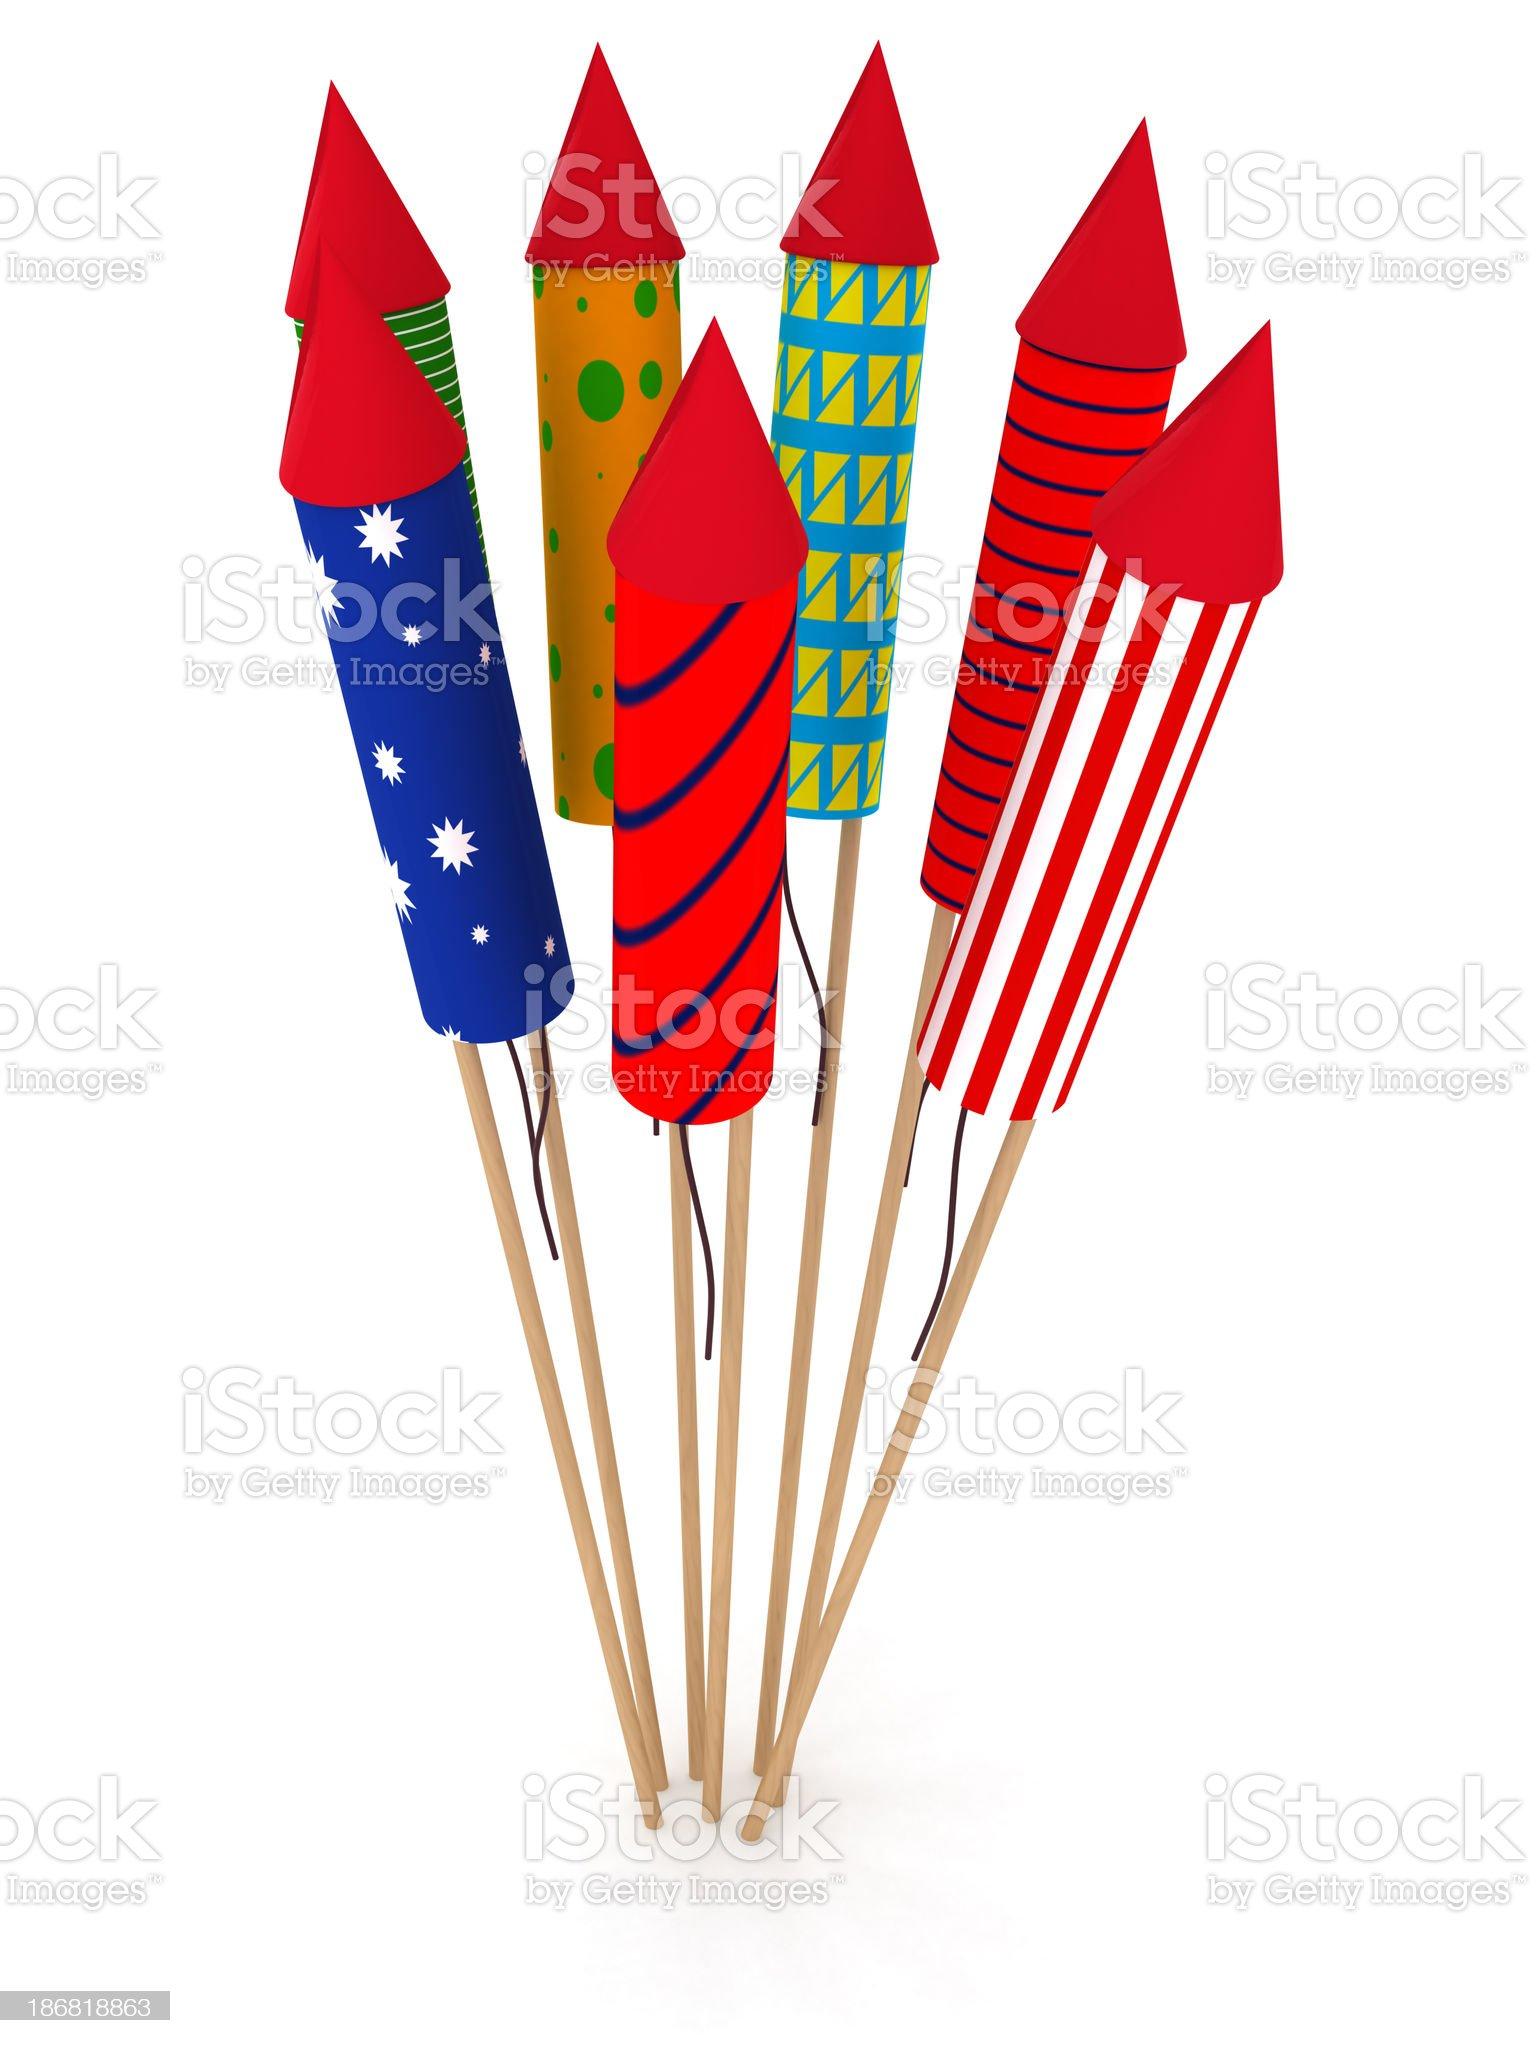 Fireworks rockets royalty-free stock photo